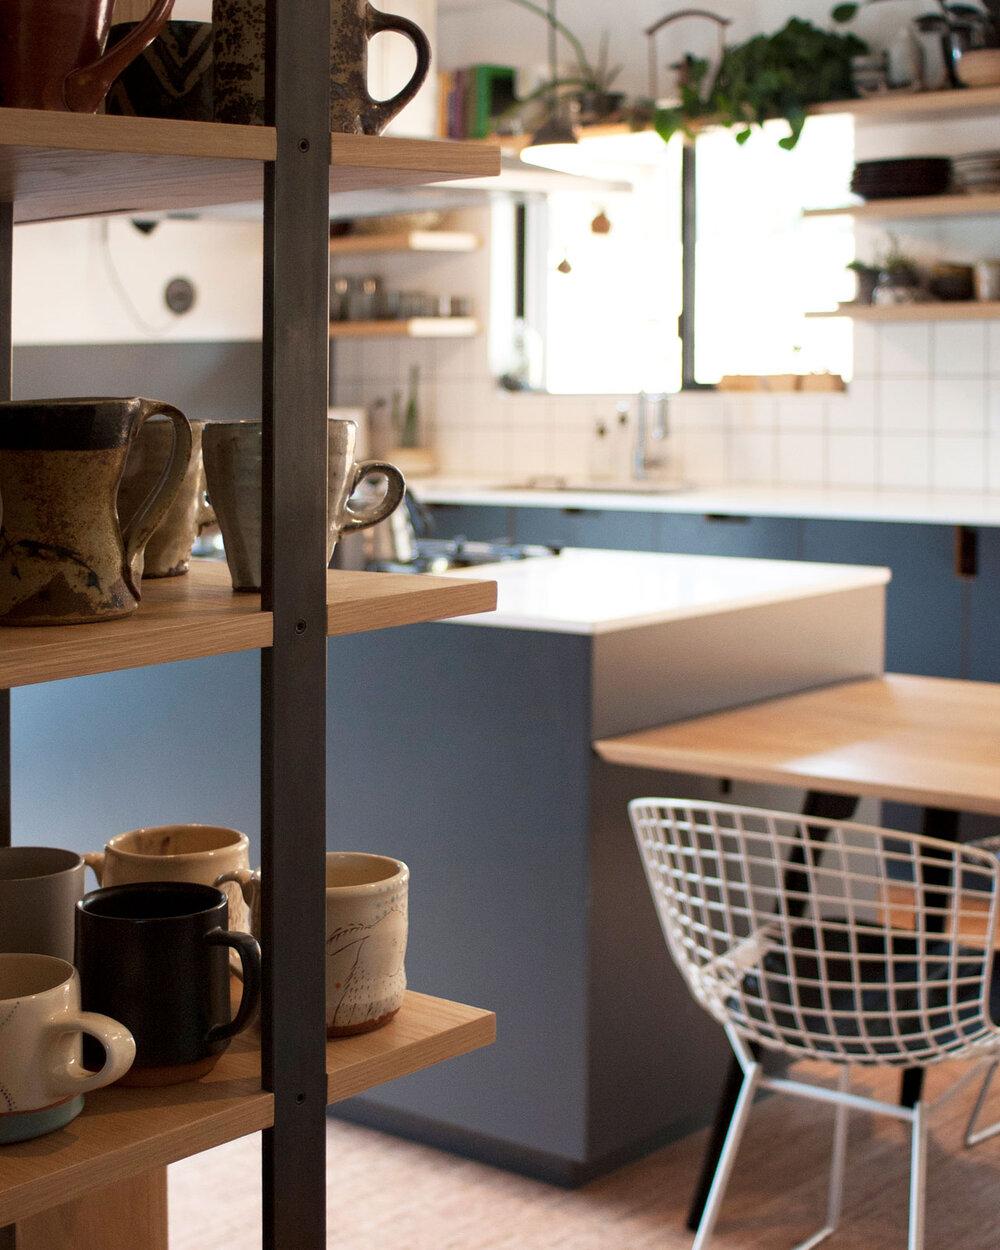 Warm, Boho Kitchen Design